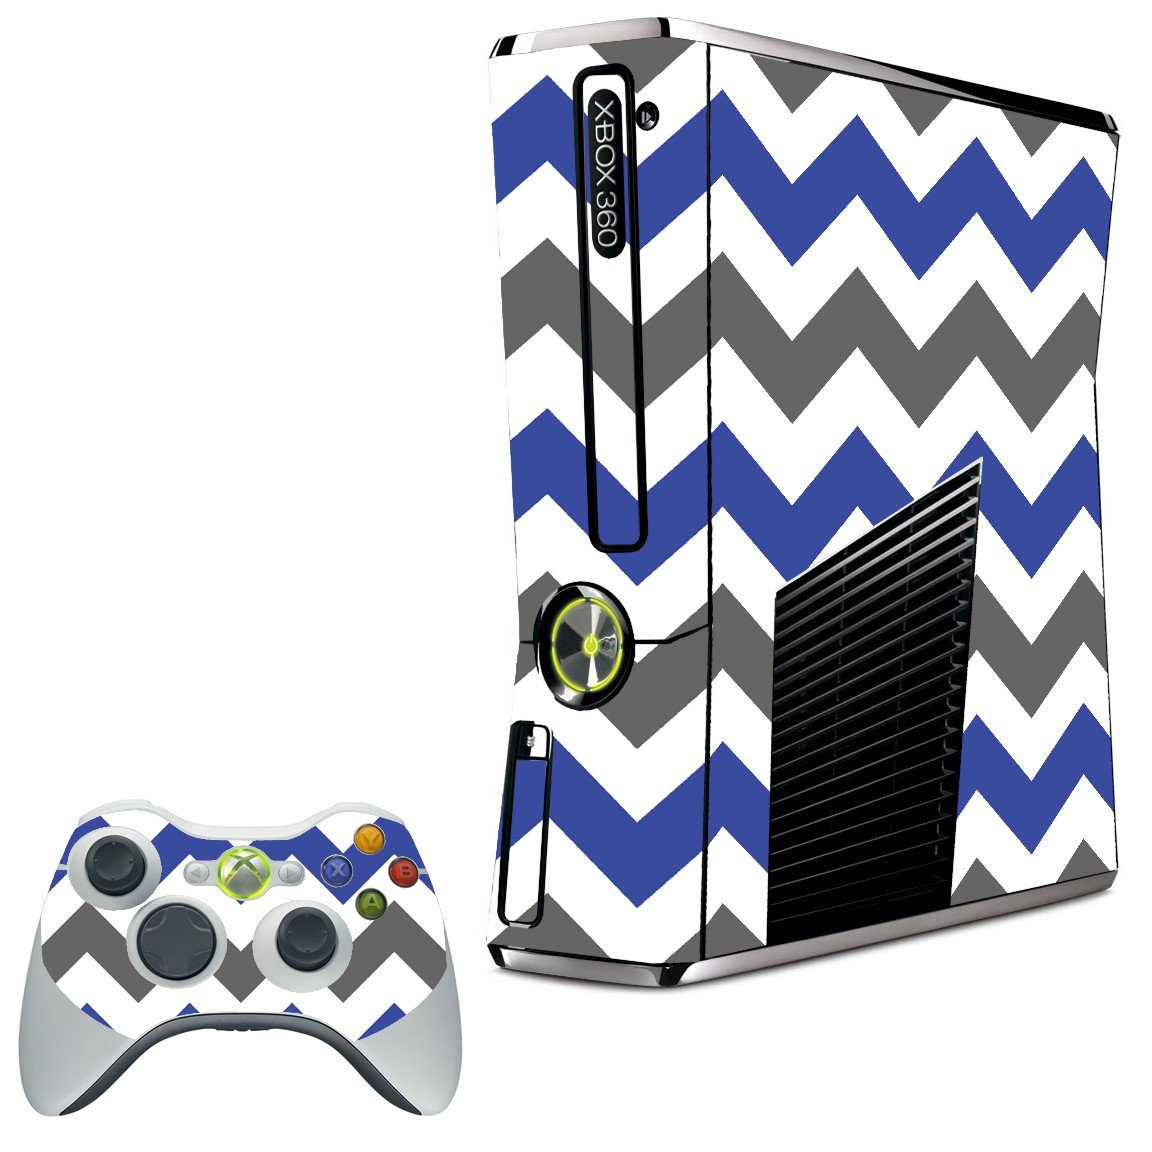 GREY BLUE CHEVRON XBOX 360 SLIM GAME CONSOLE SKIN